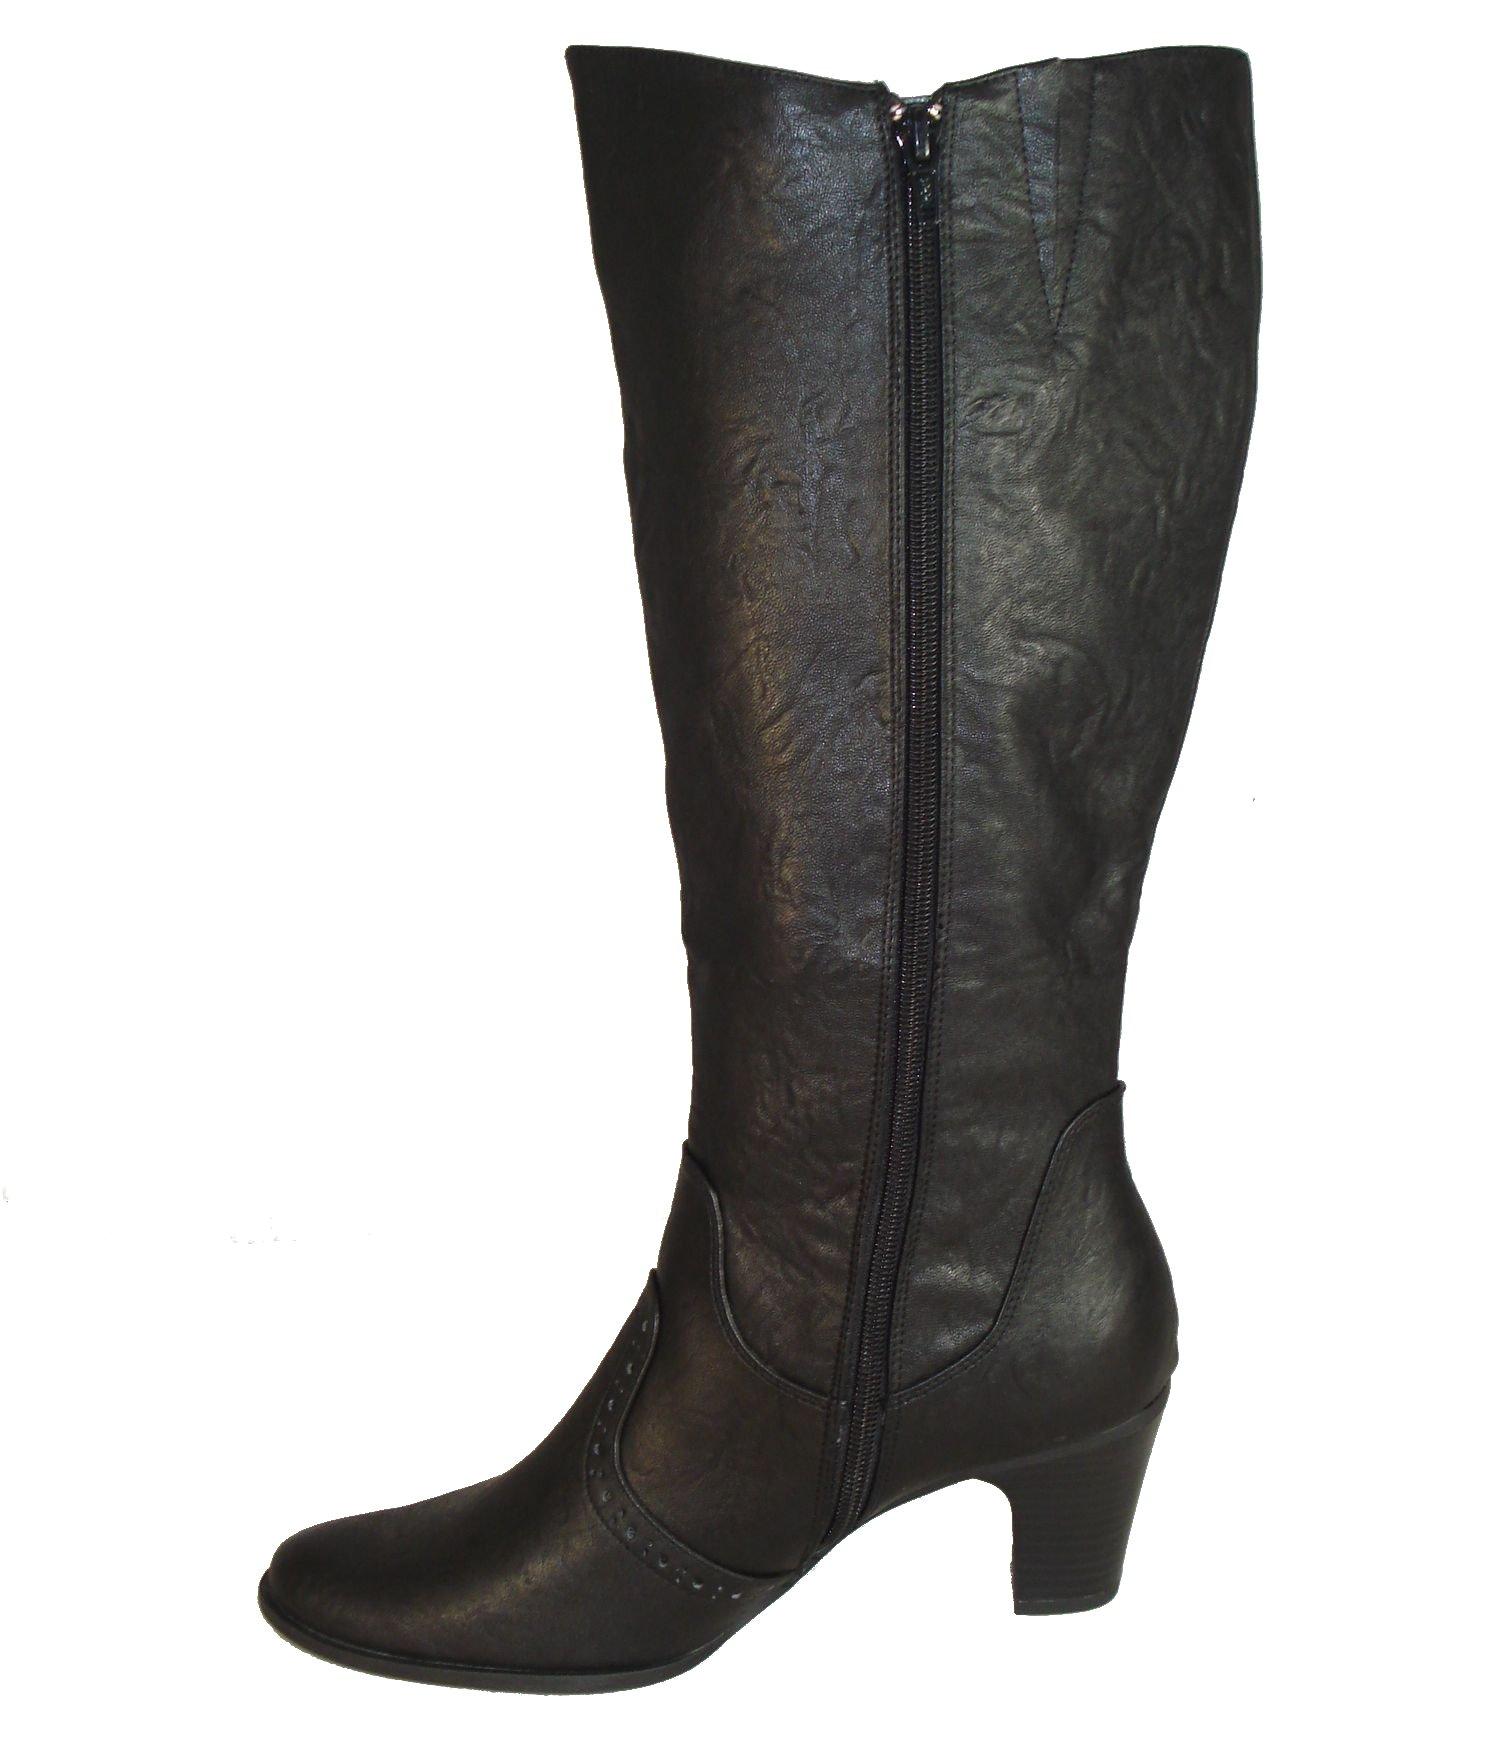 adjustable calf wide leg fit boots black ebay